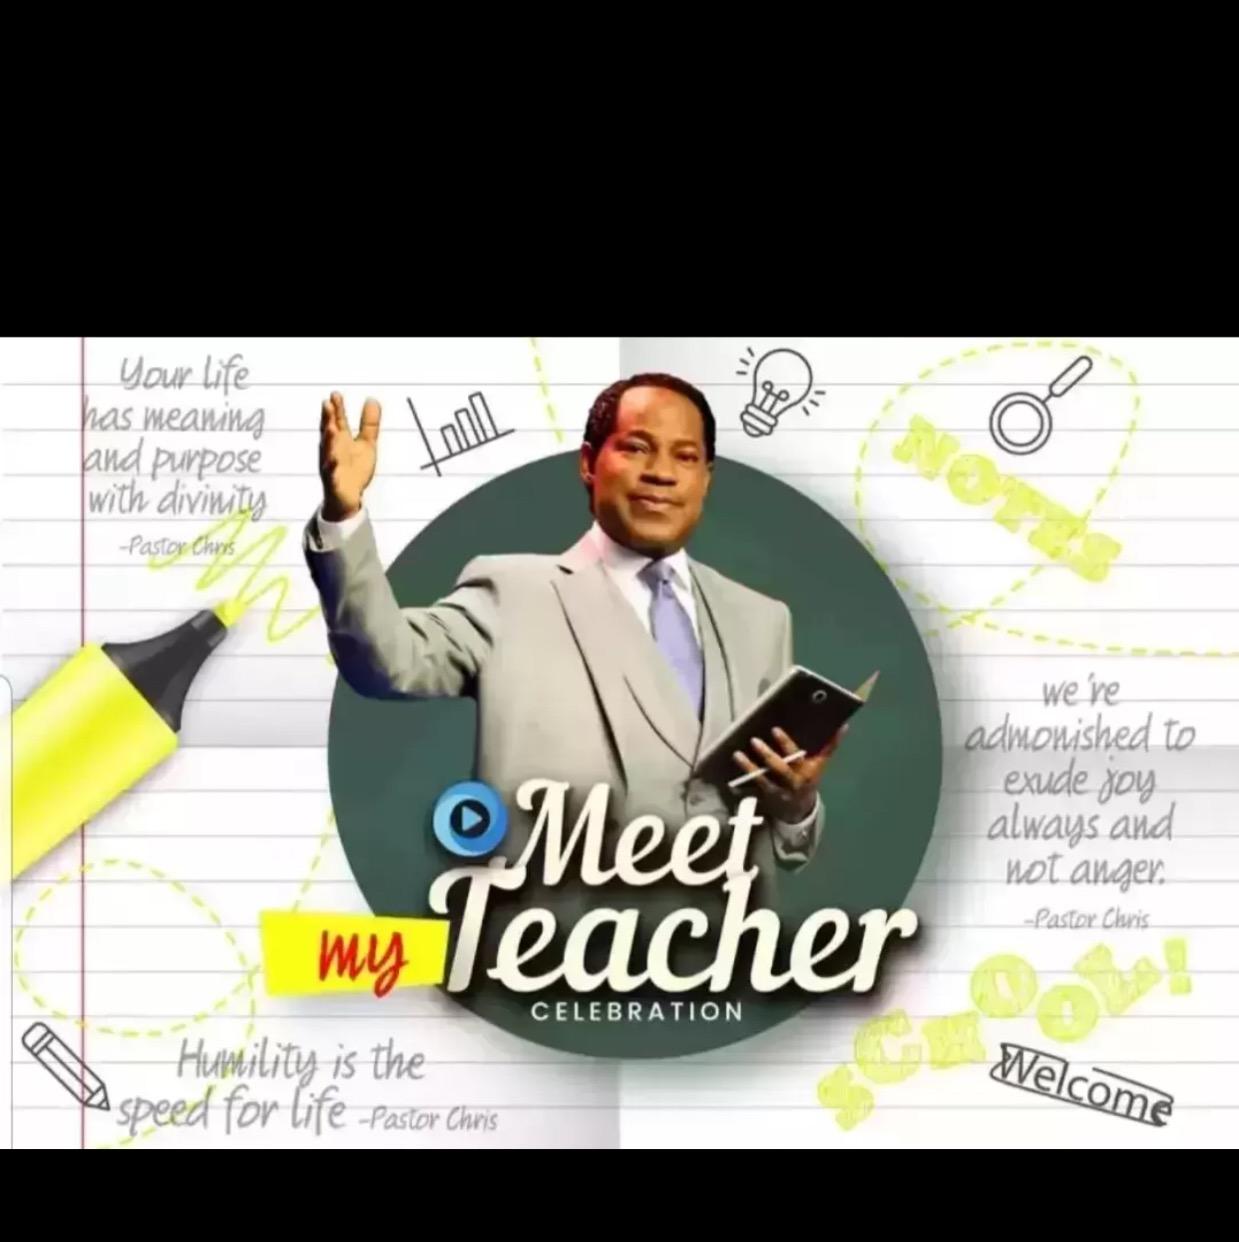 My teacher is the best